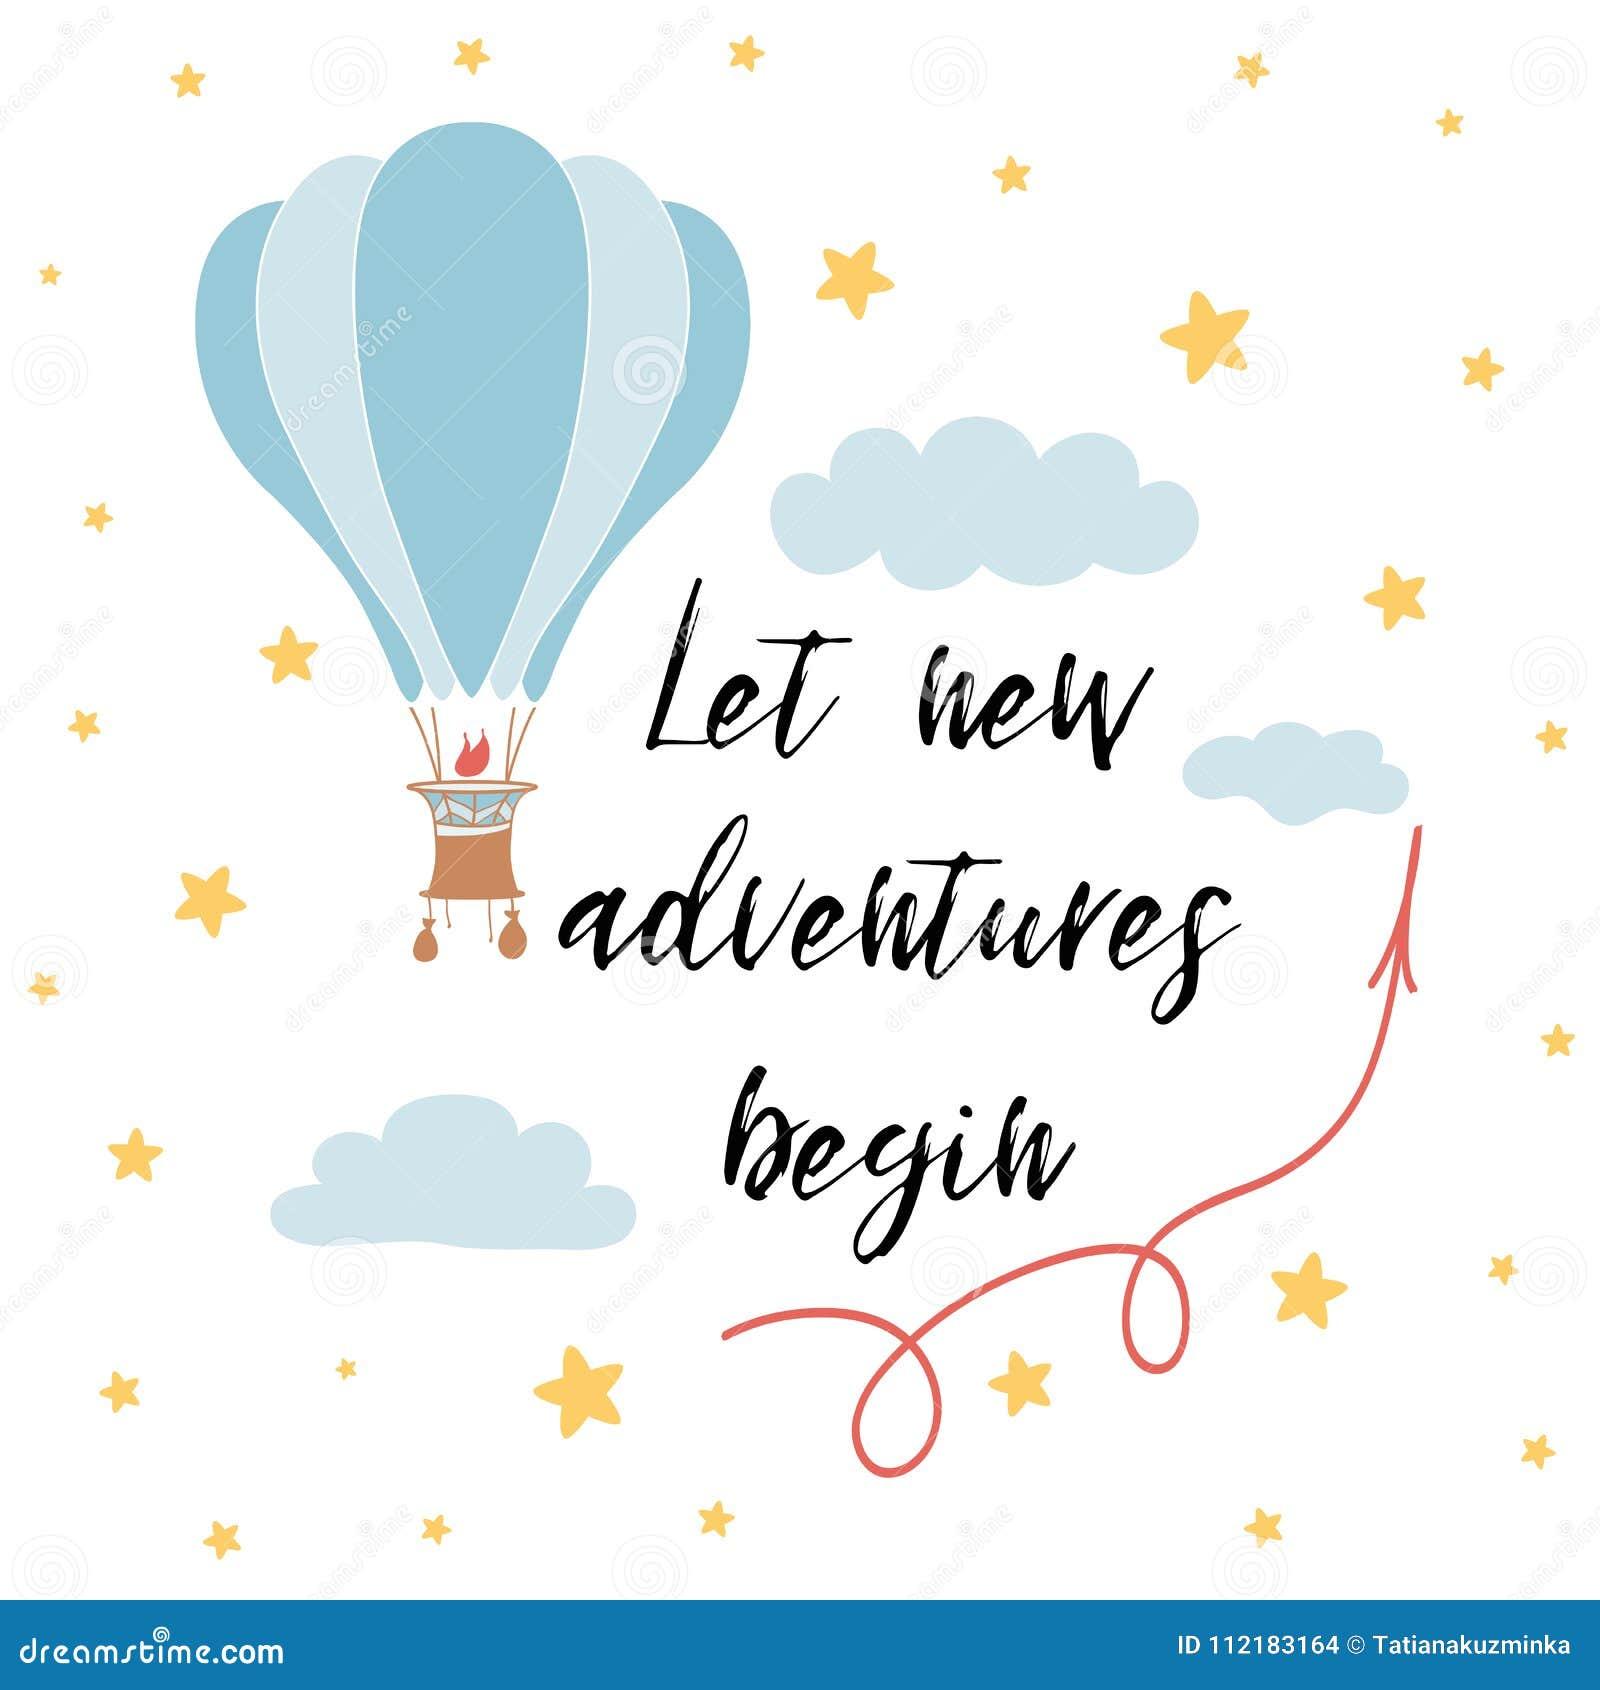 Let new adventures begin slogan for shirt print design with hot air balloon. Vector phrase